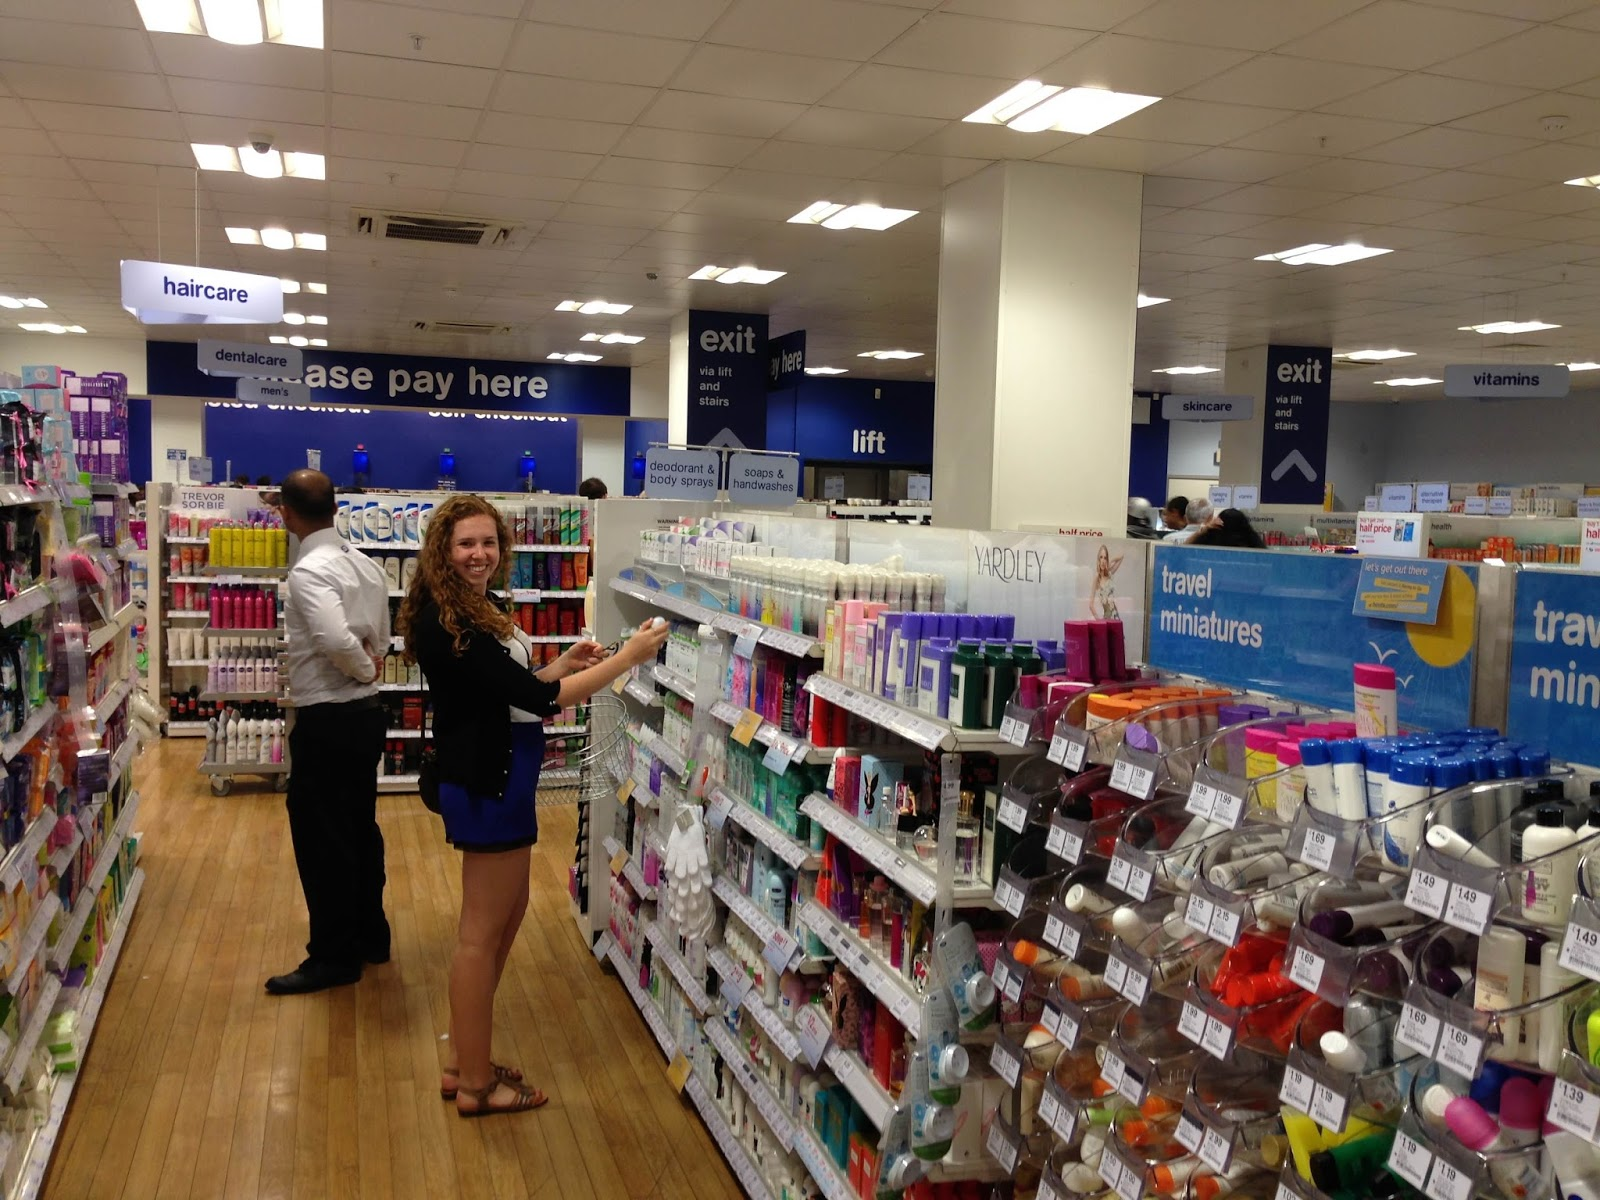 drug channels my visit to boots uk an international pharmacy photo essay. Black Bedroom Furniture Sets. Home Design Ideas